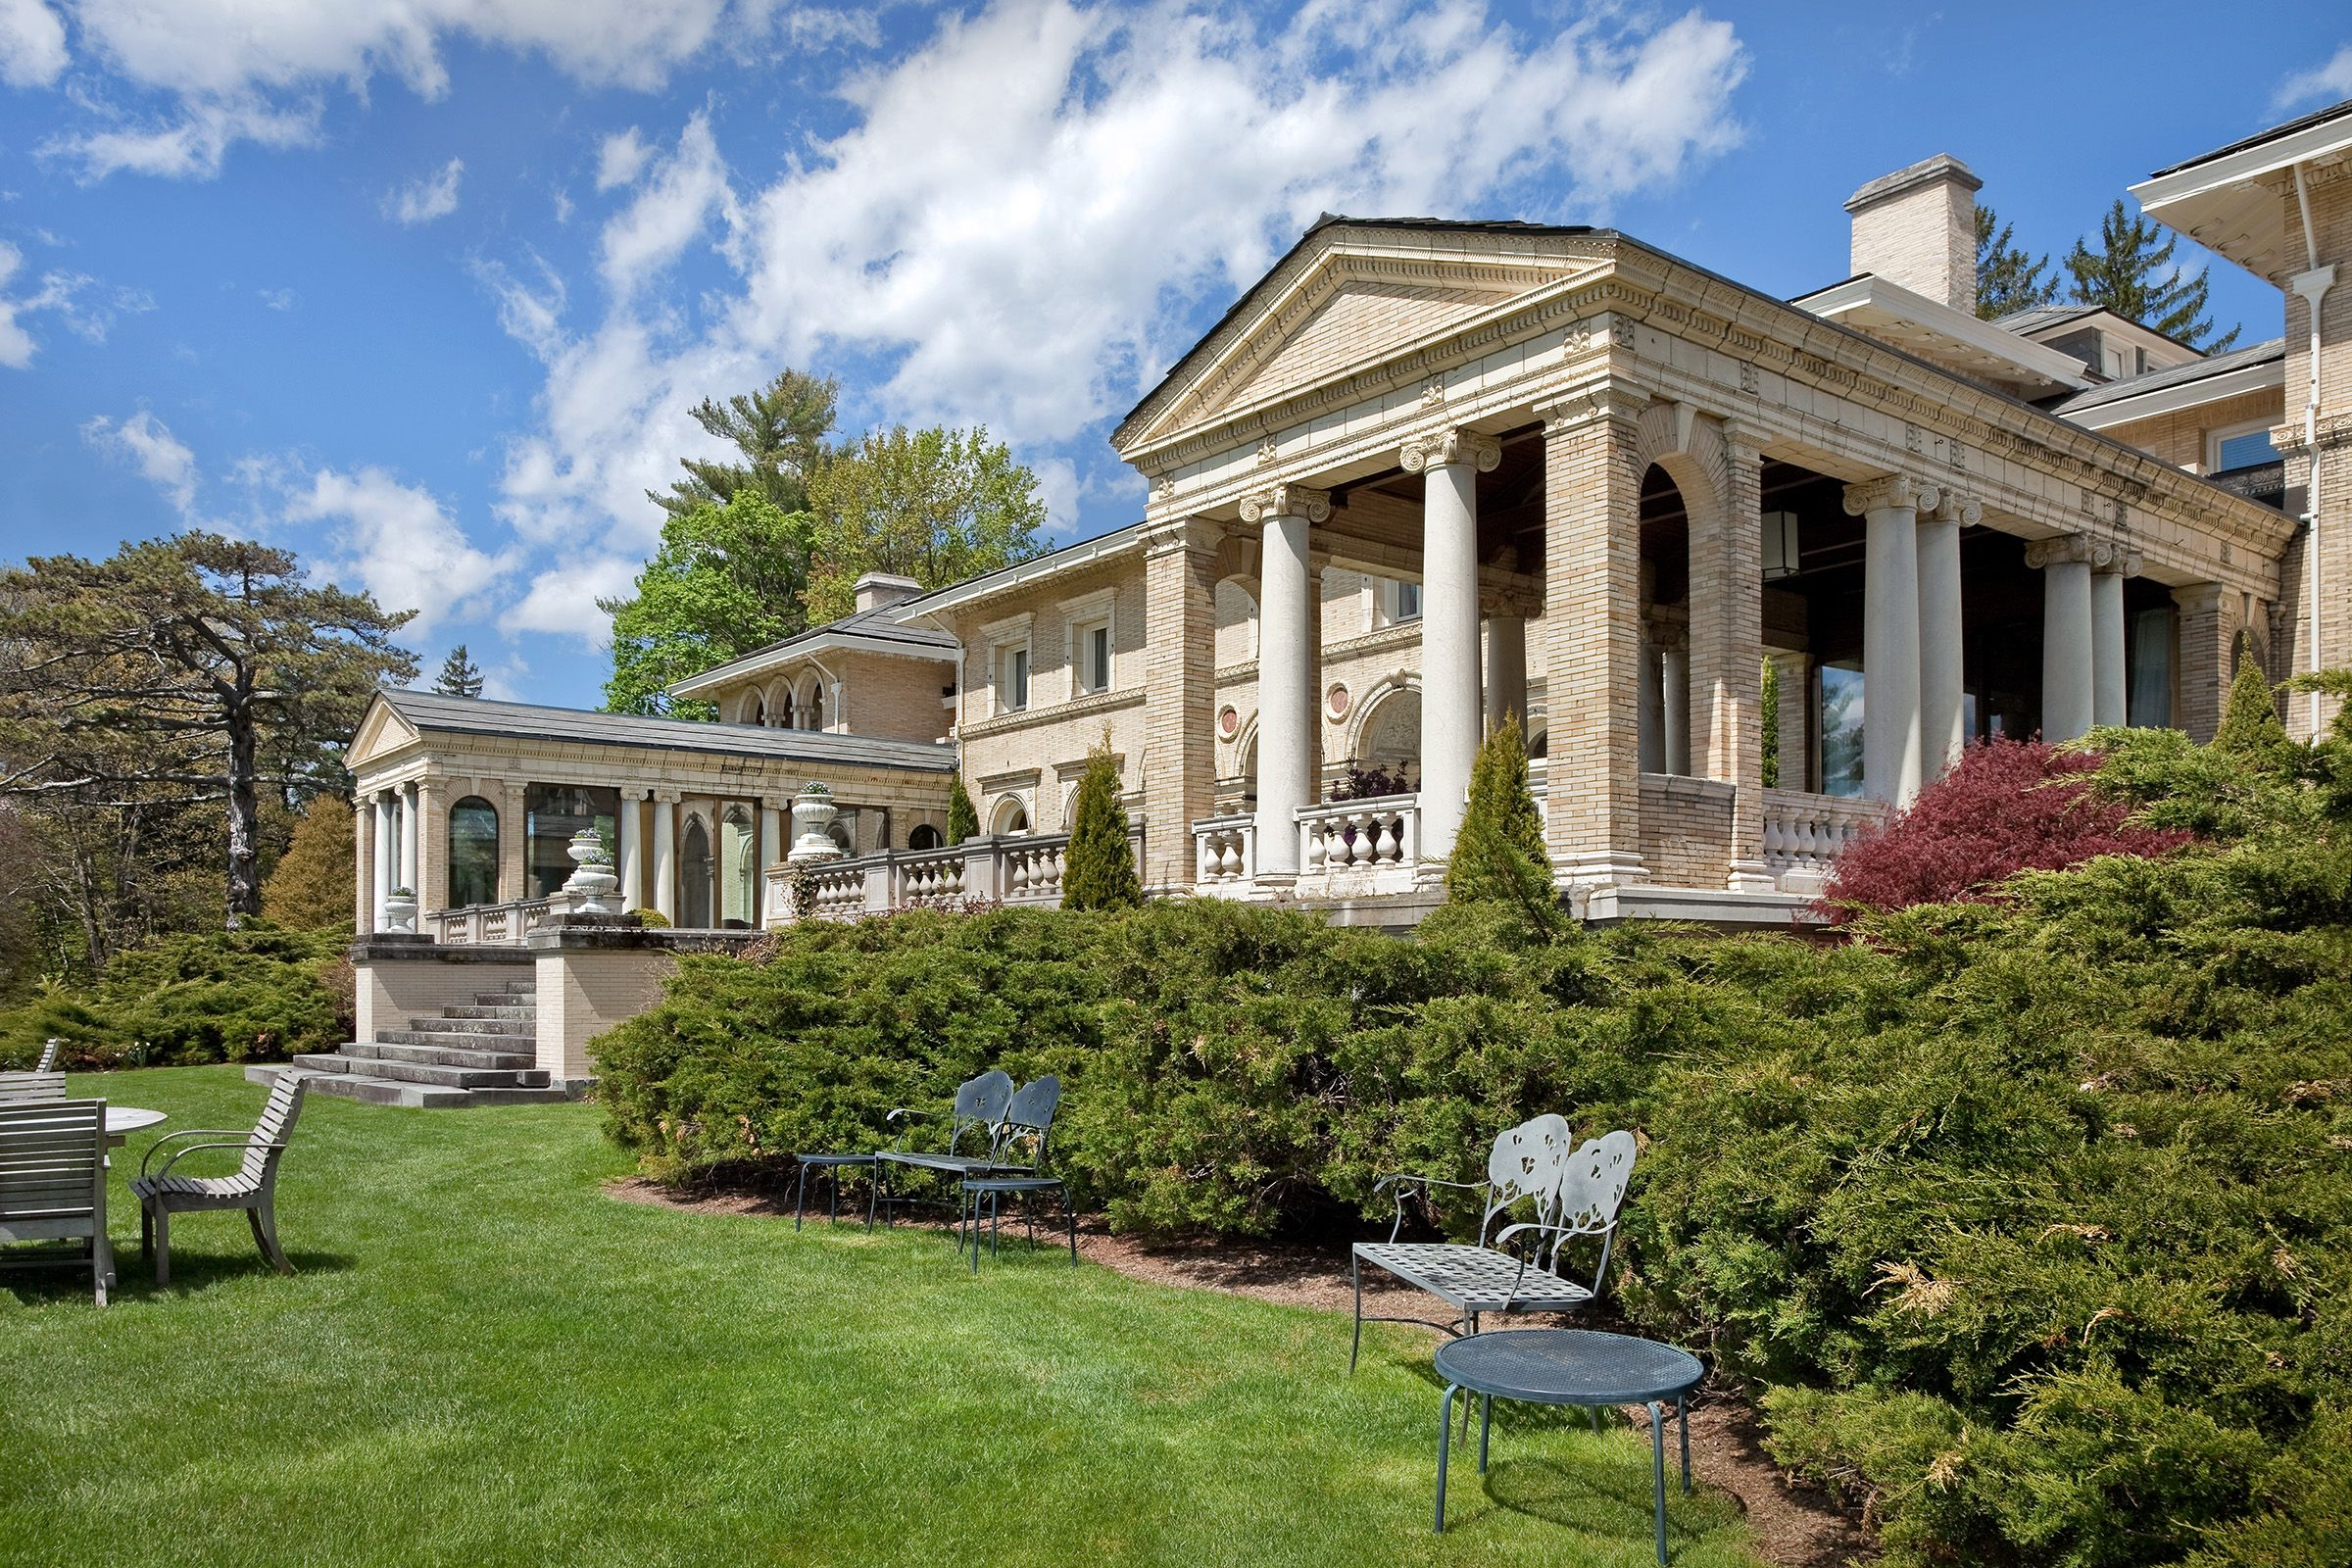 Wheatleigh An Italian Inspired Gem In The Heart Of Berkshires Lenox Machusetts